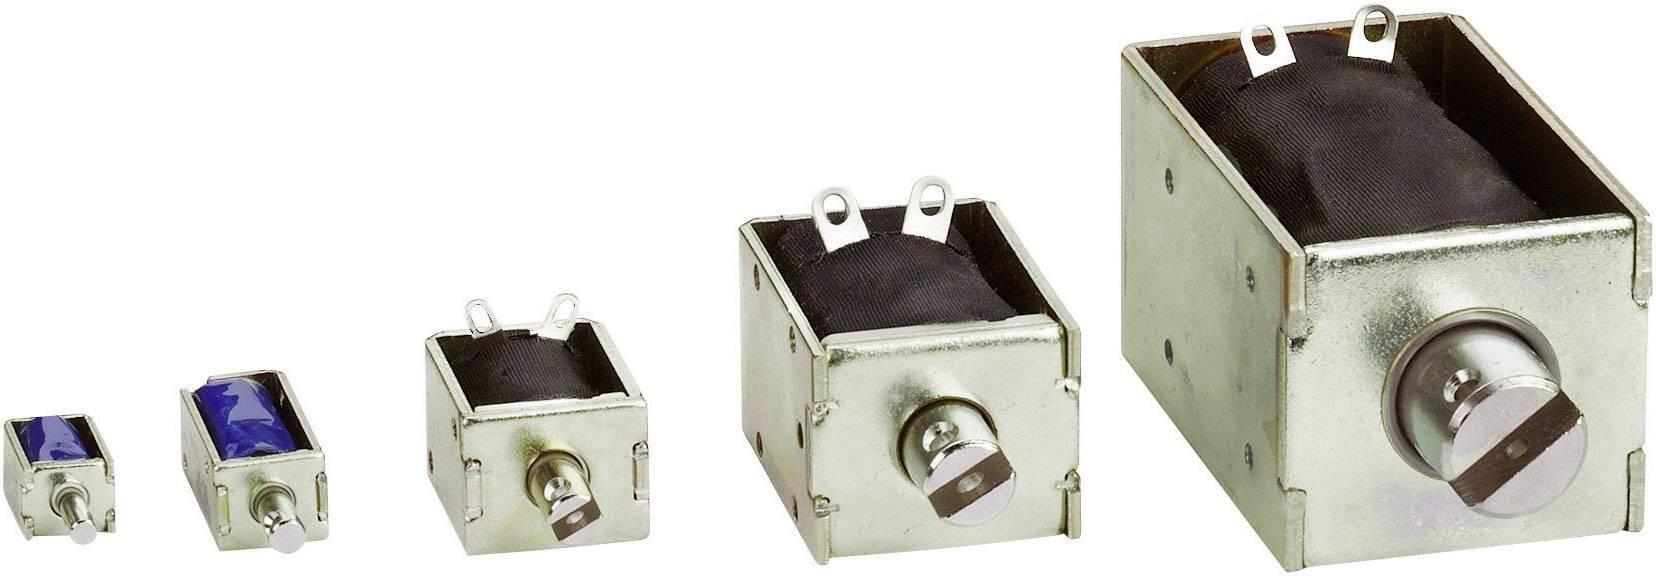 Zdvihací magnet zdvíhacie EBE Group TDS-16A 3100204, 4 N, 39 N, 12 V/DC, 9.5 W